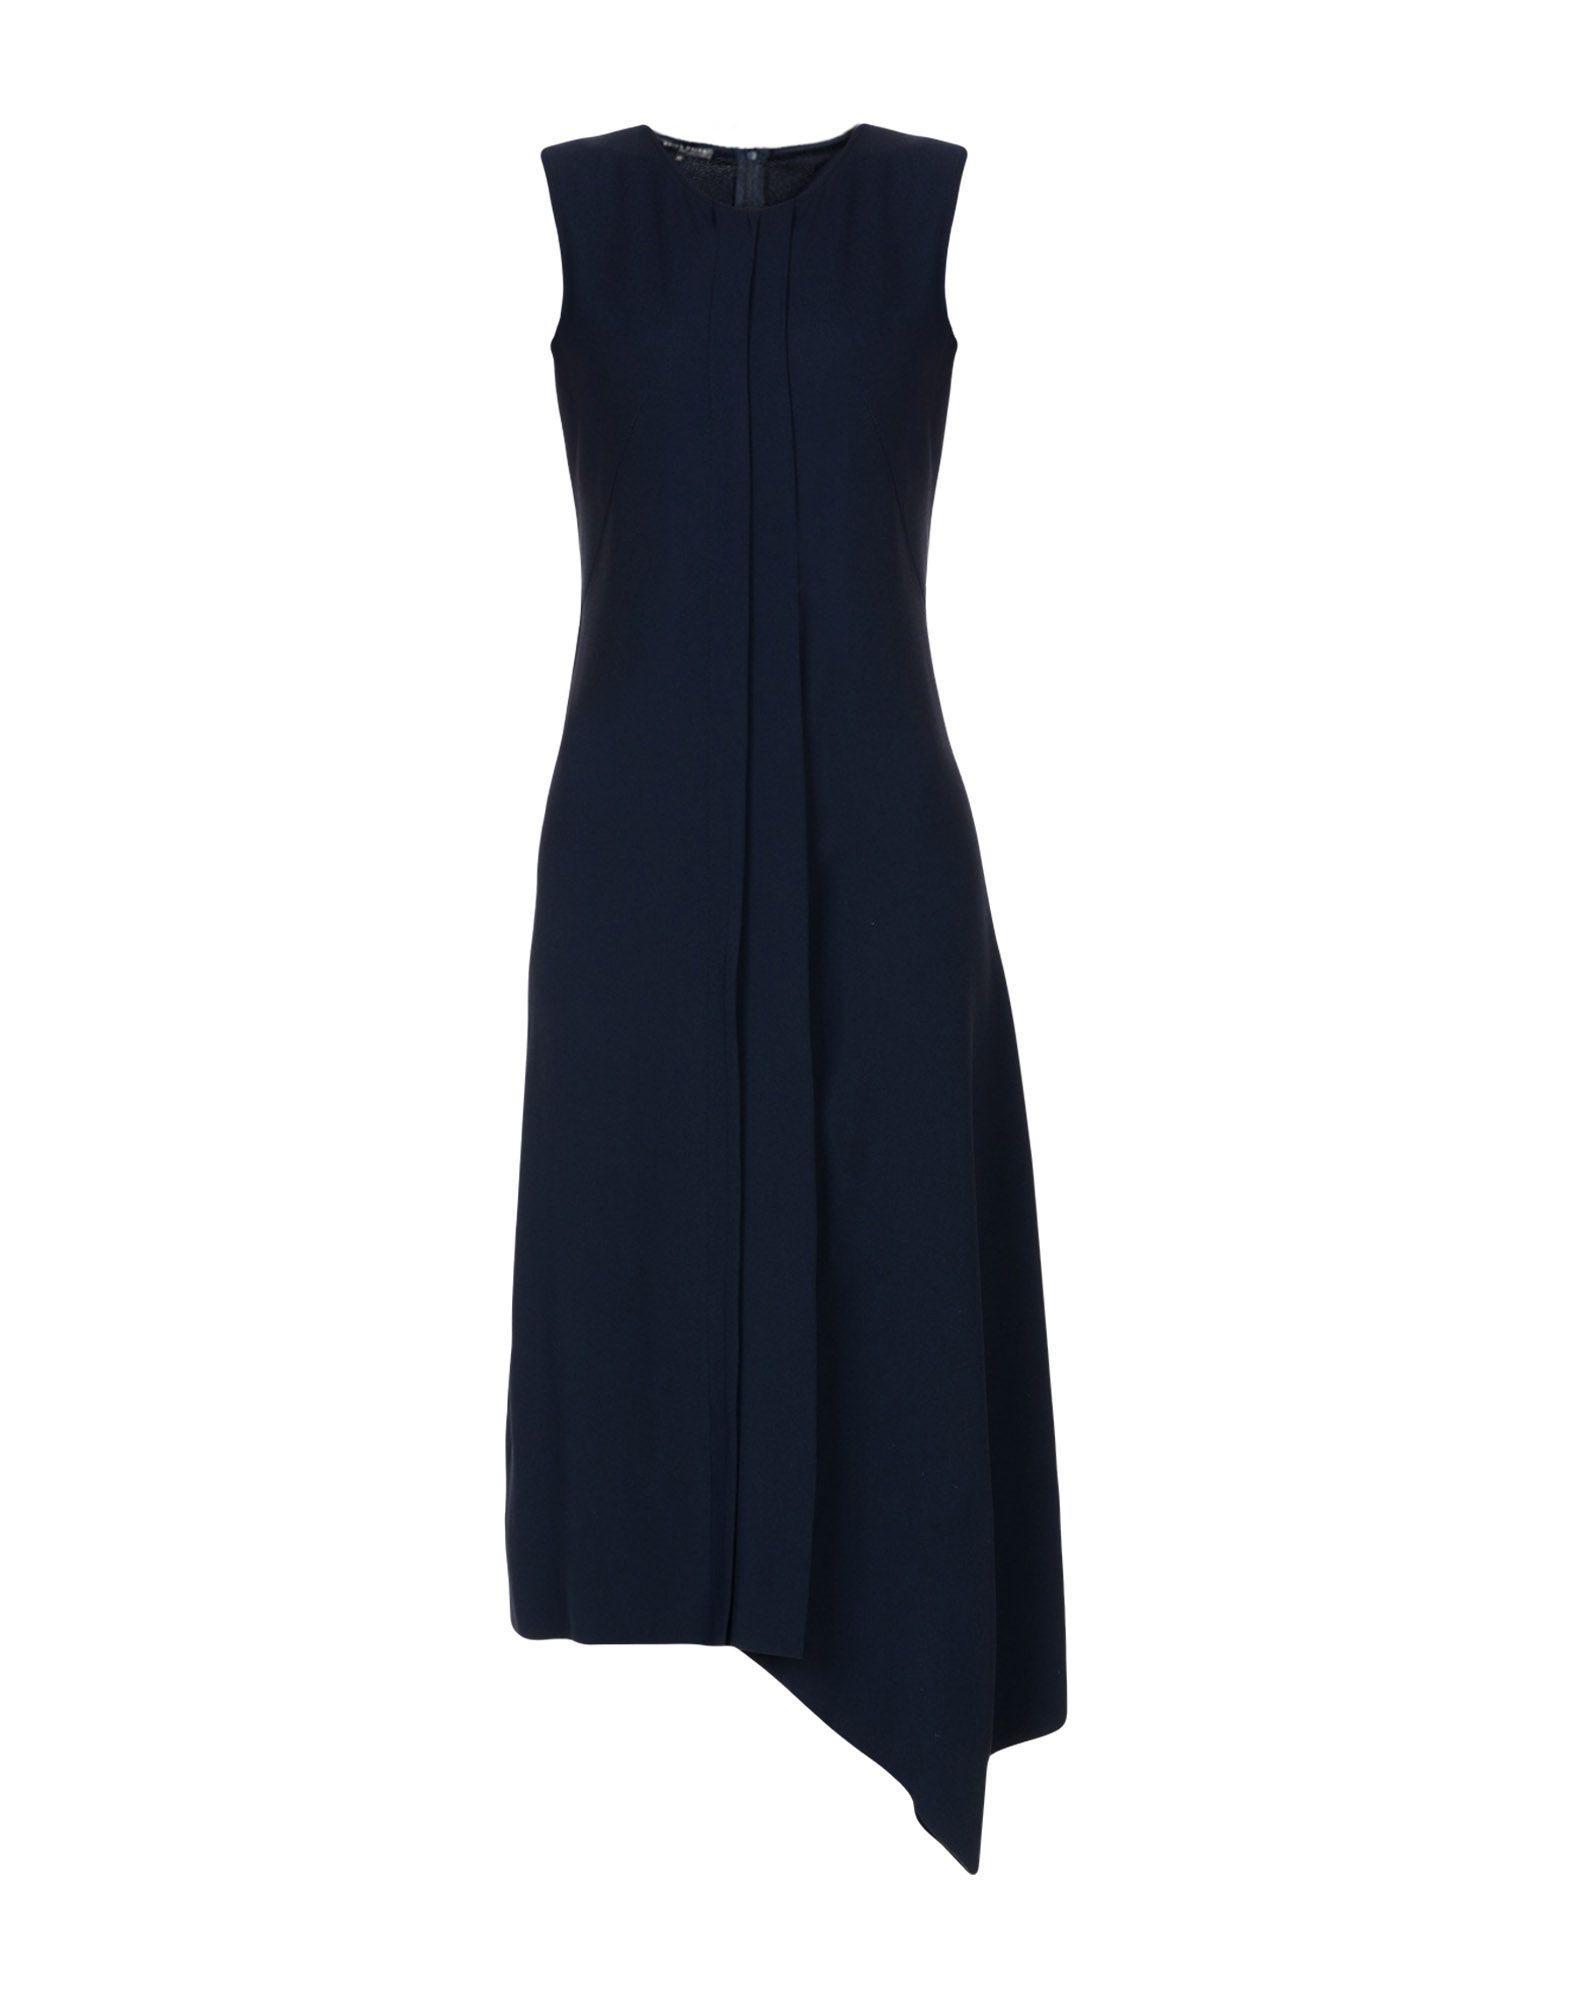 DRESSES - 3/4 length dresses Brian Dales F3wN2CqOej